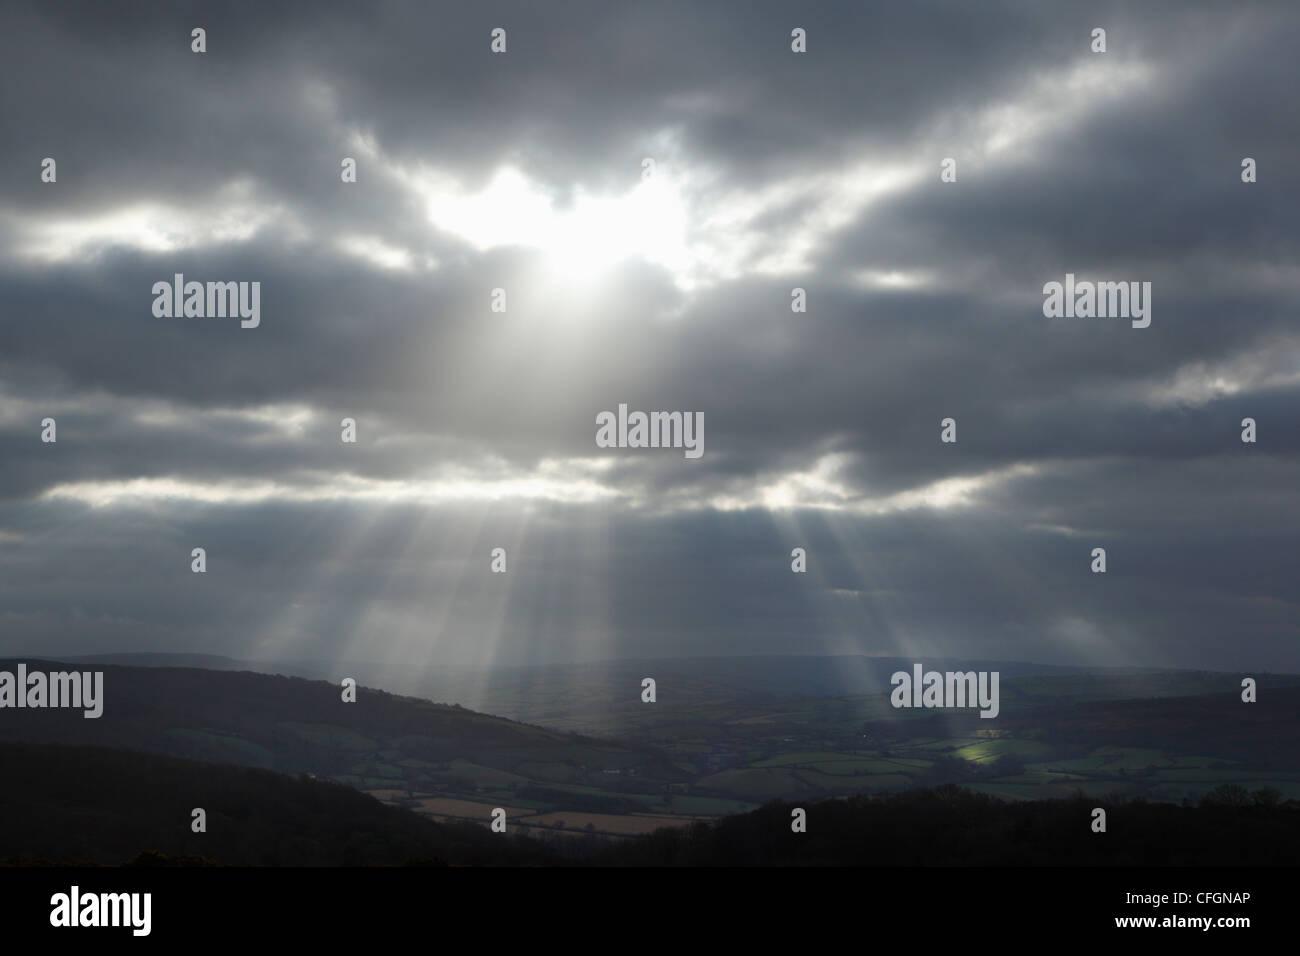 Ciel orageux sur Exmoor National Park. Le Somerset. L'Angleterre. UK. Photo Stock